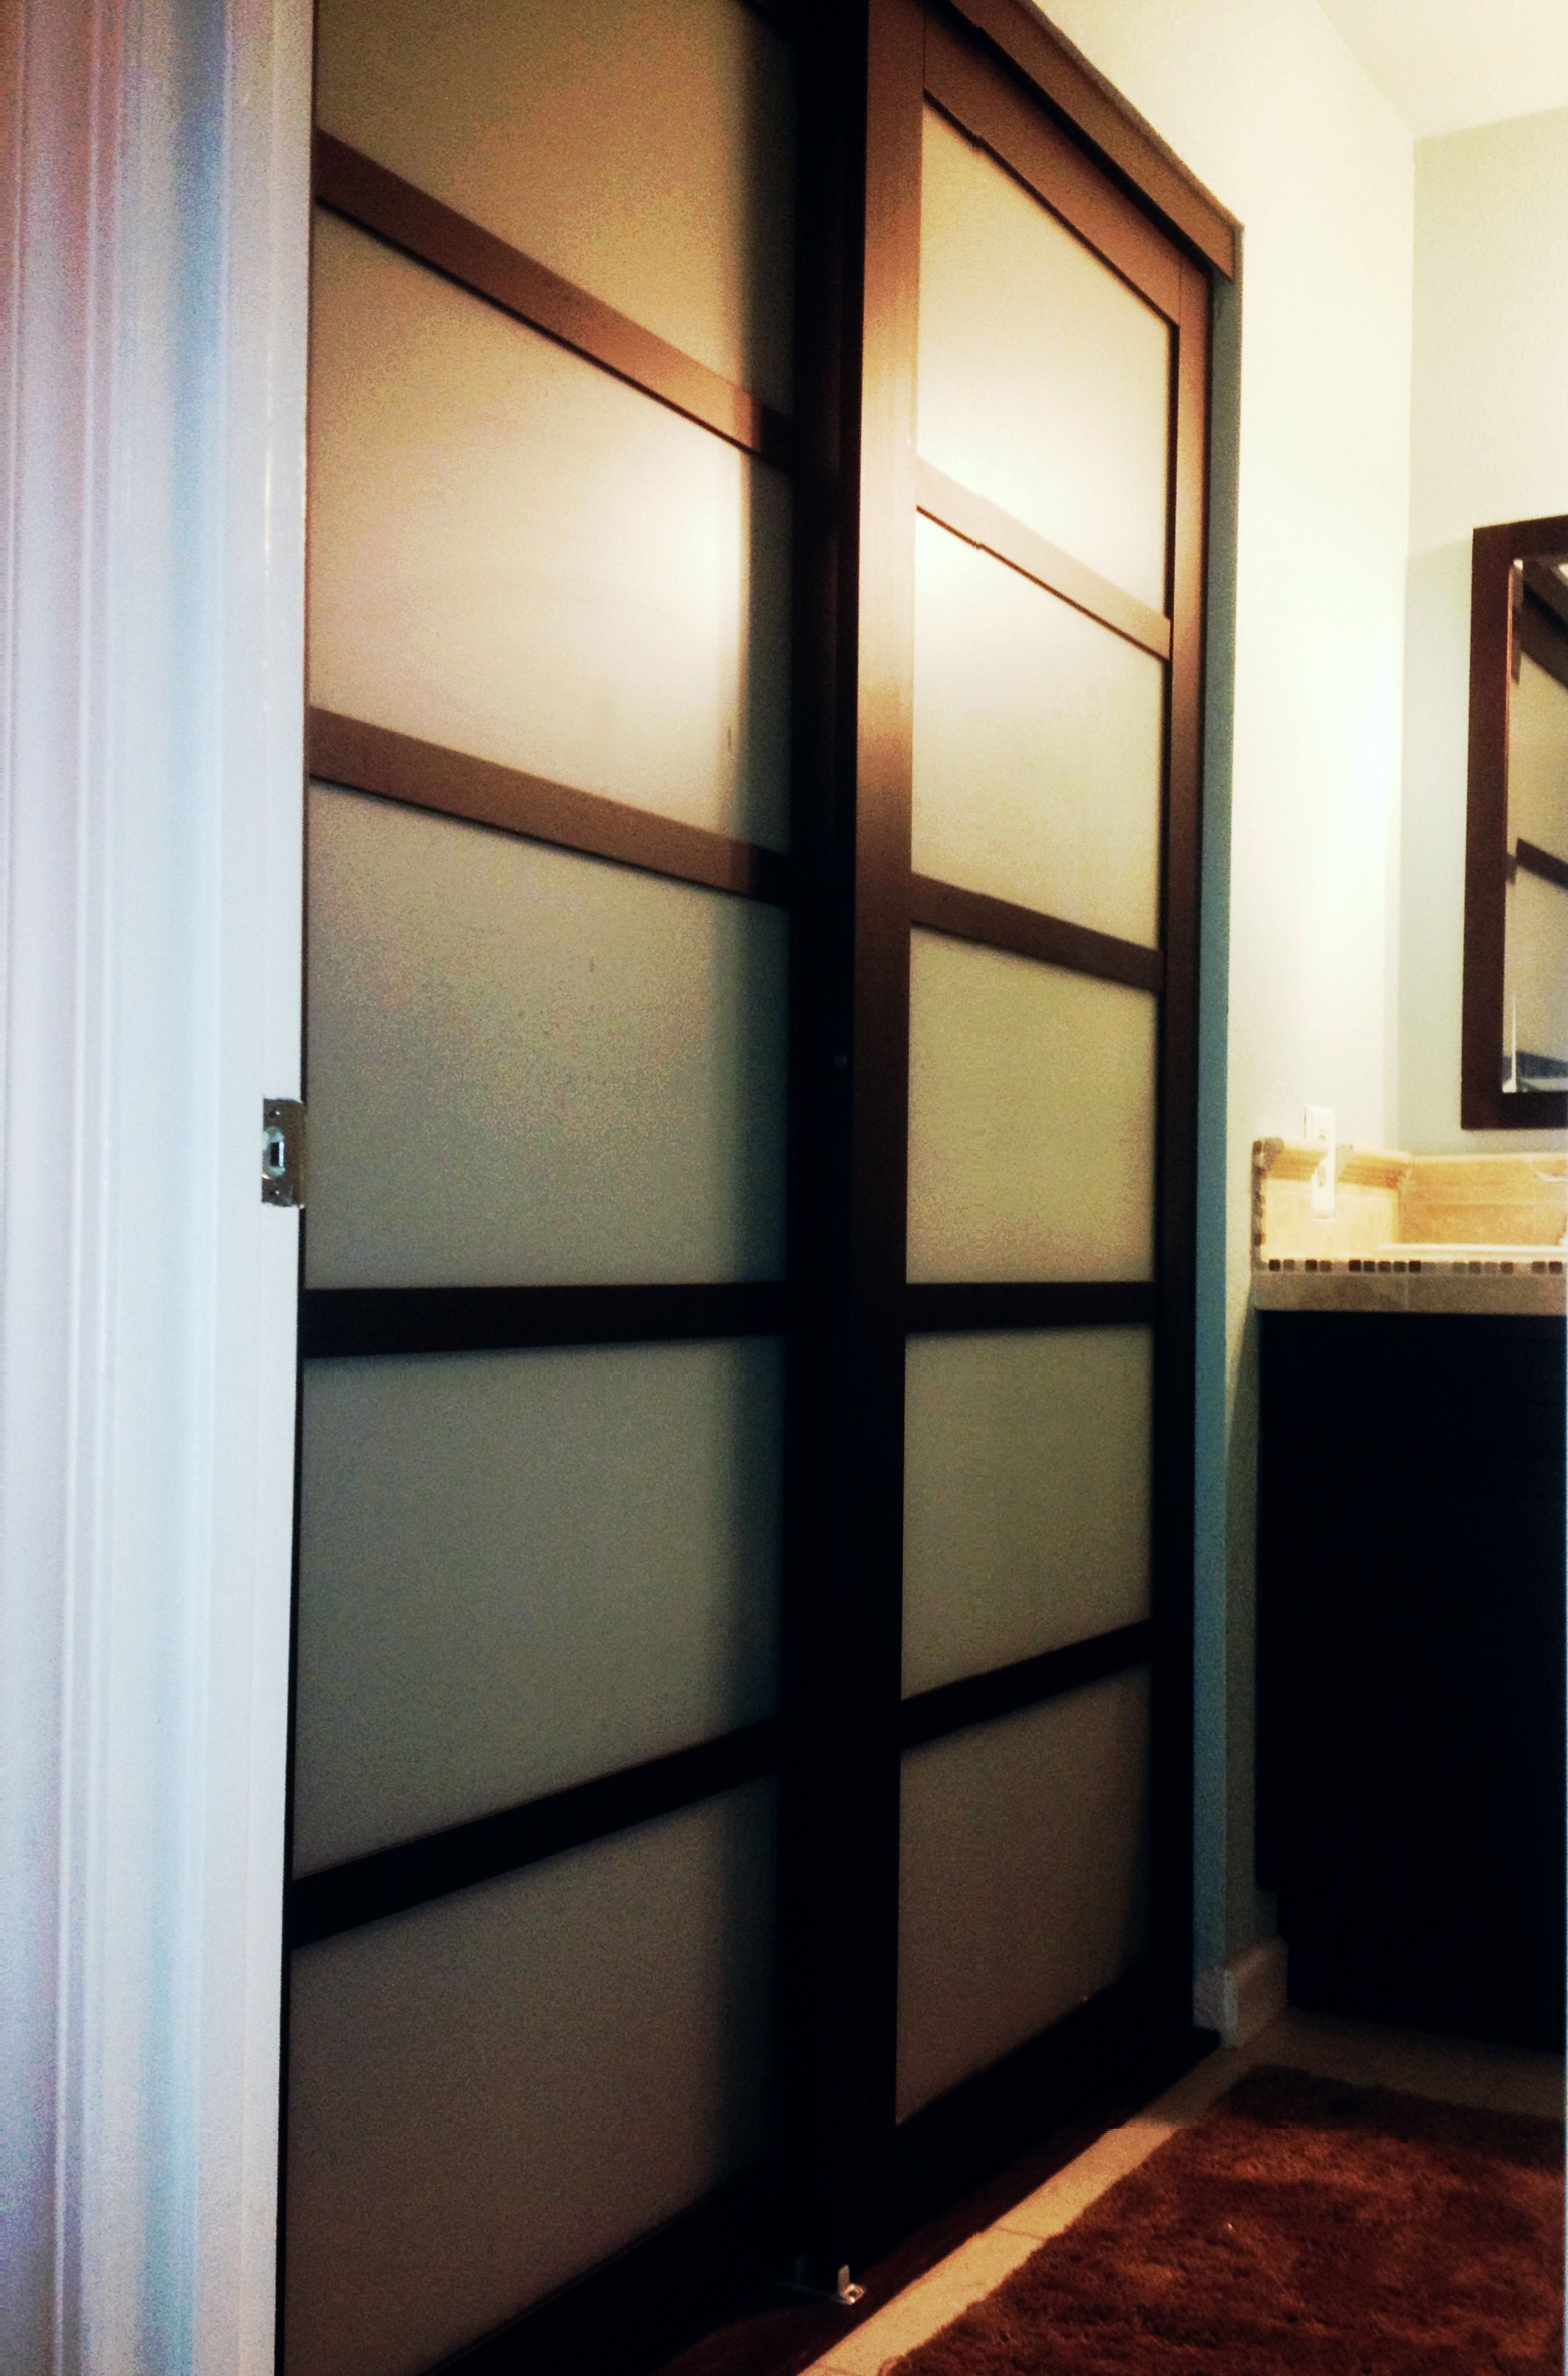 Custom Made Sliding Shoji Closet Doors with Synskin Panels